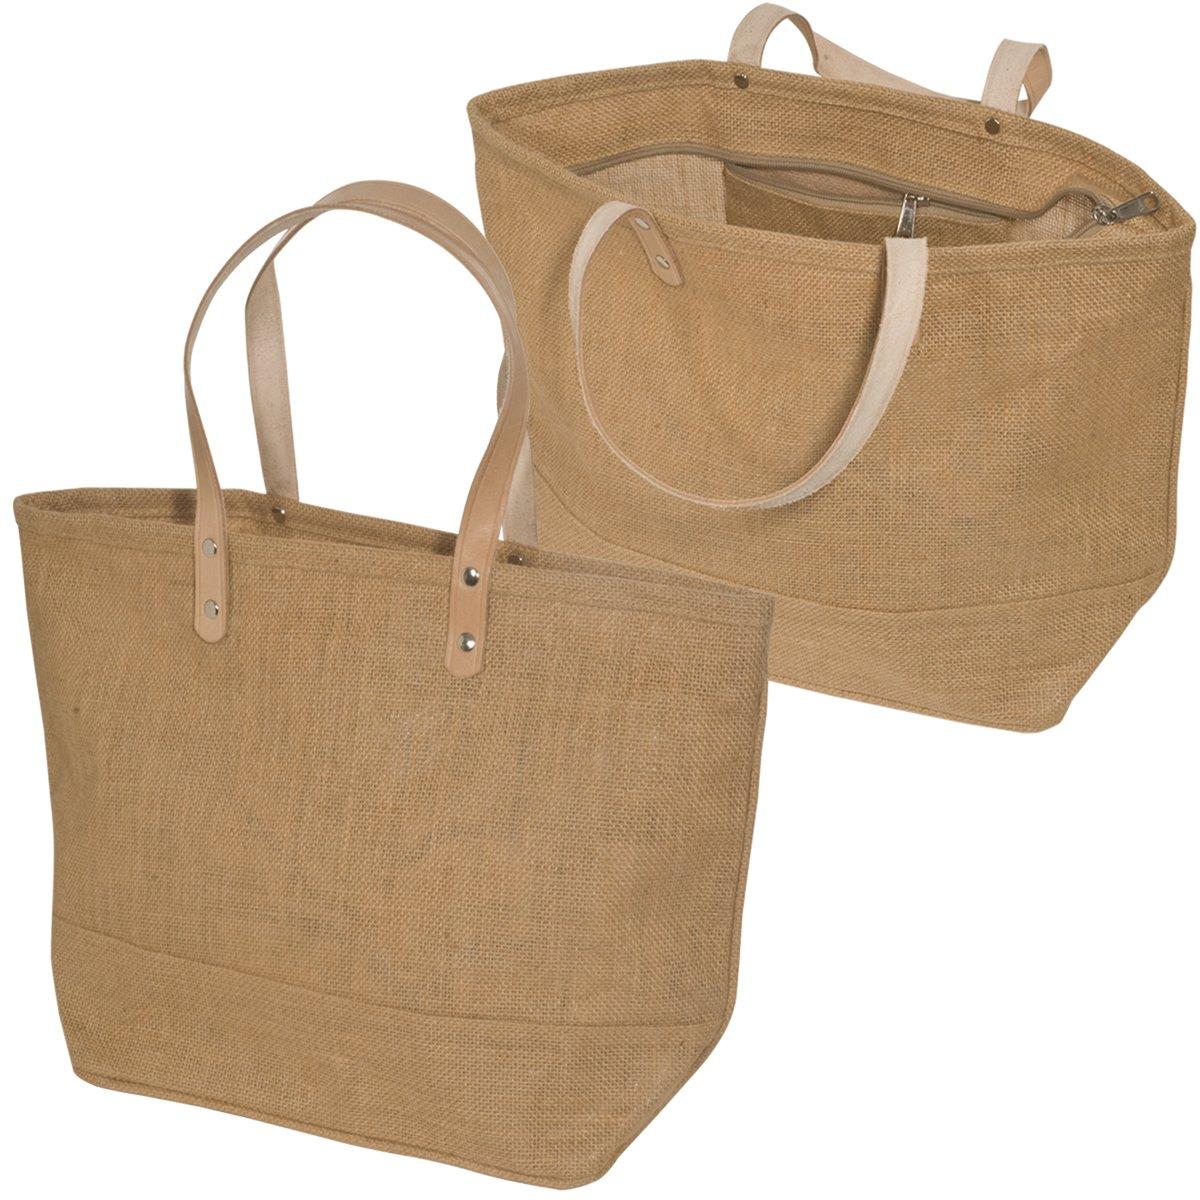 Amazon.com: Bolsa de yute con asas de piel, tamaño 17.25 ...